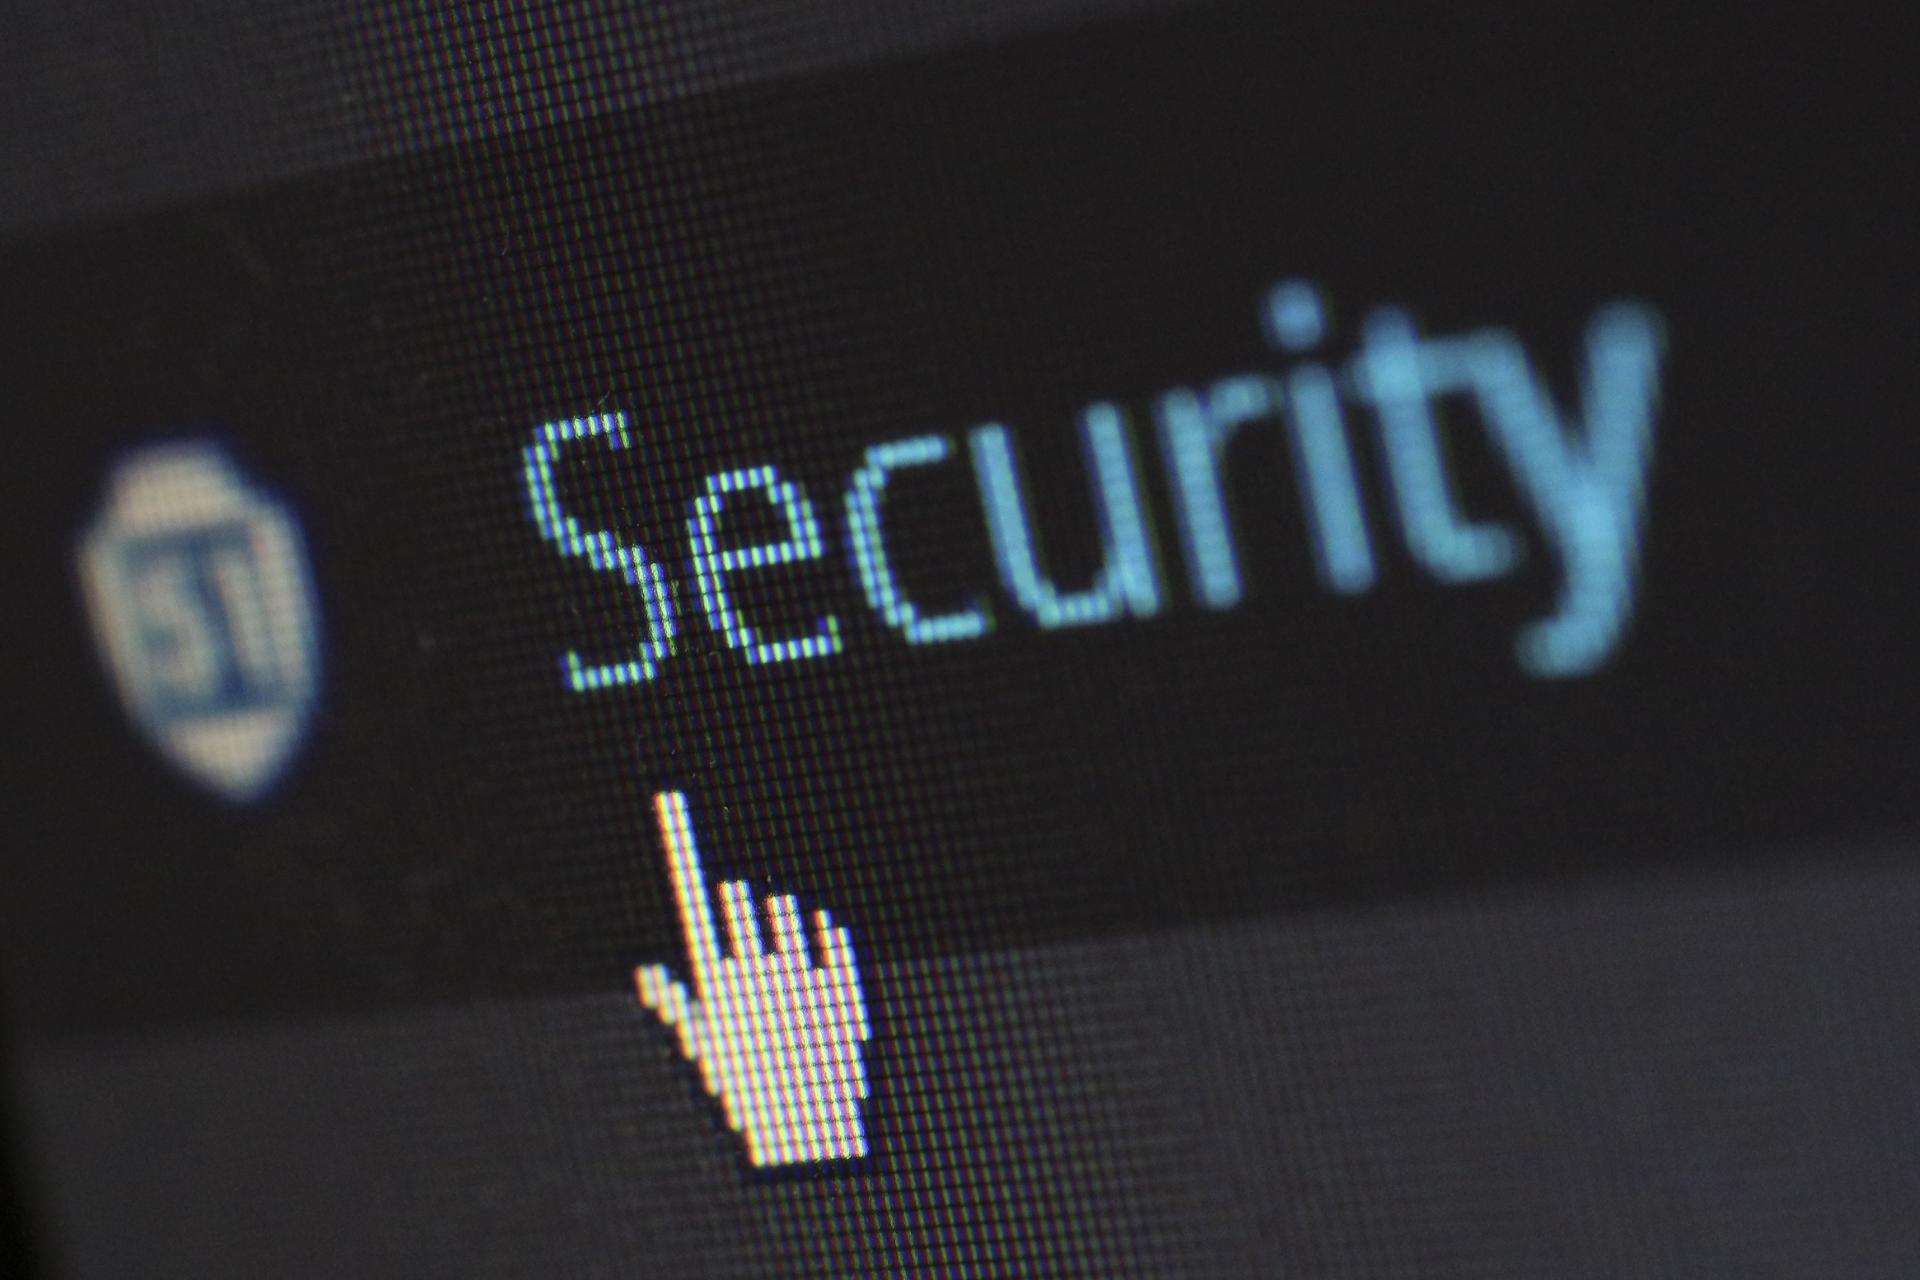 Security written on a computer screen